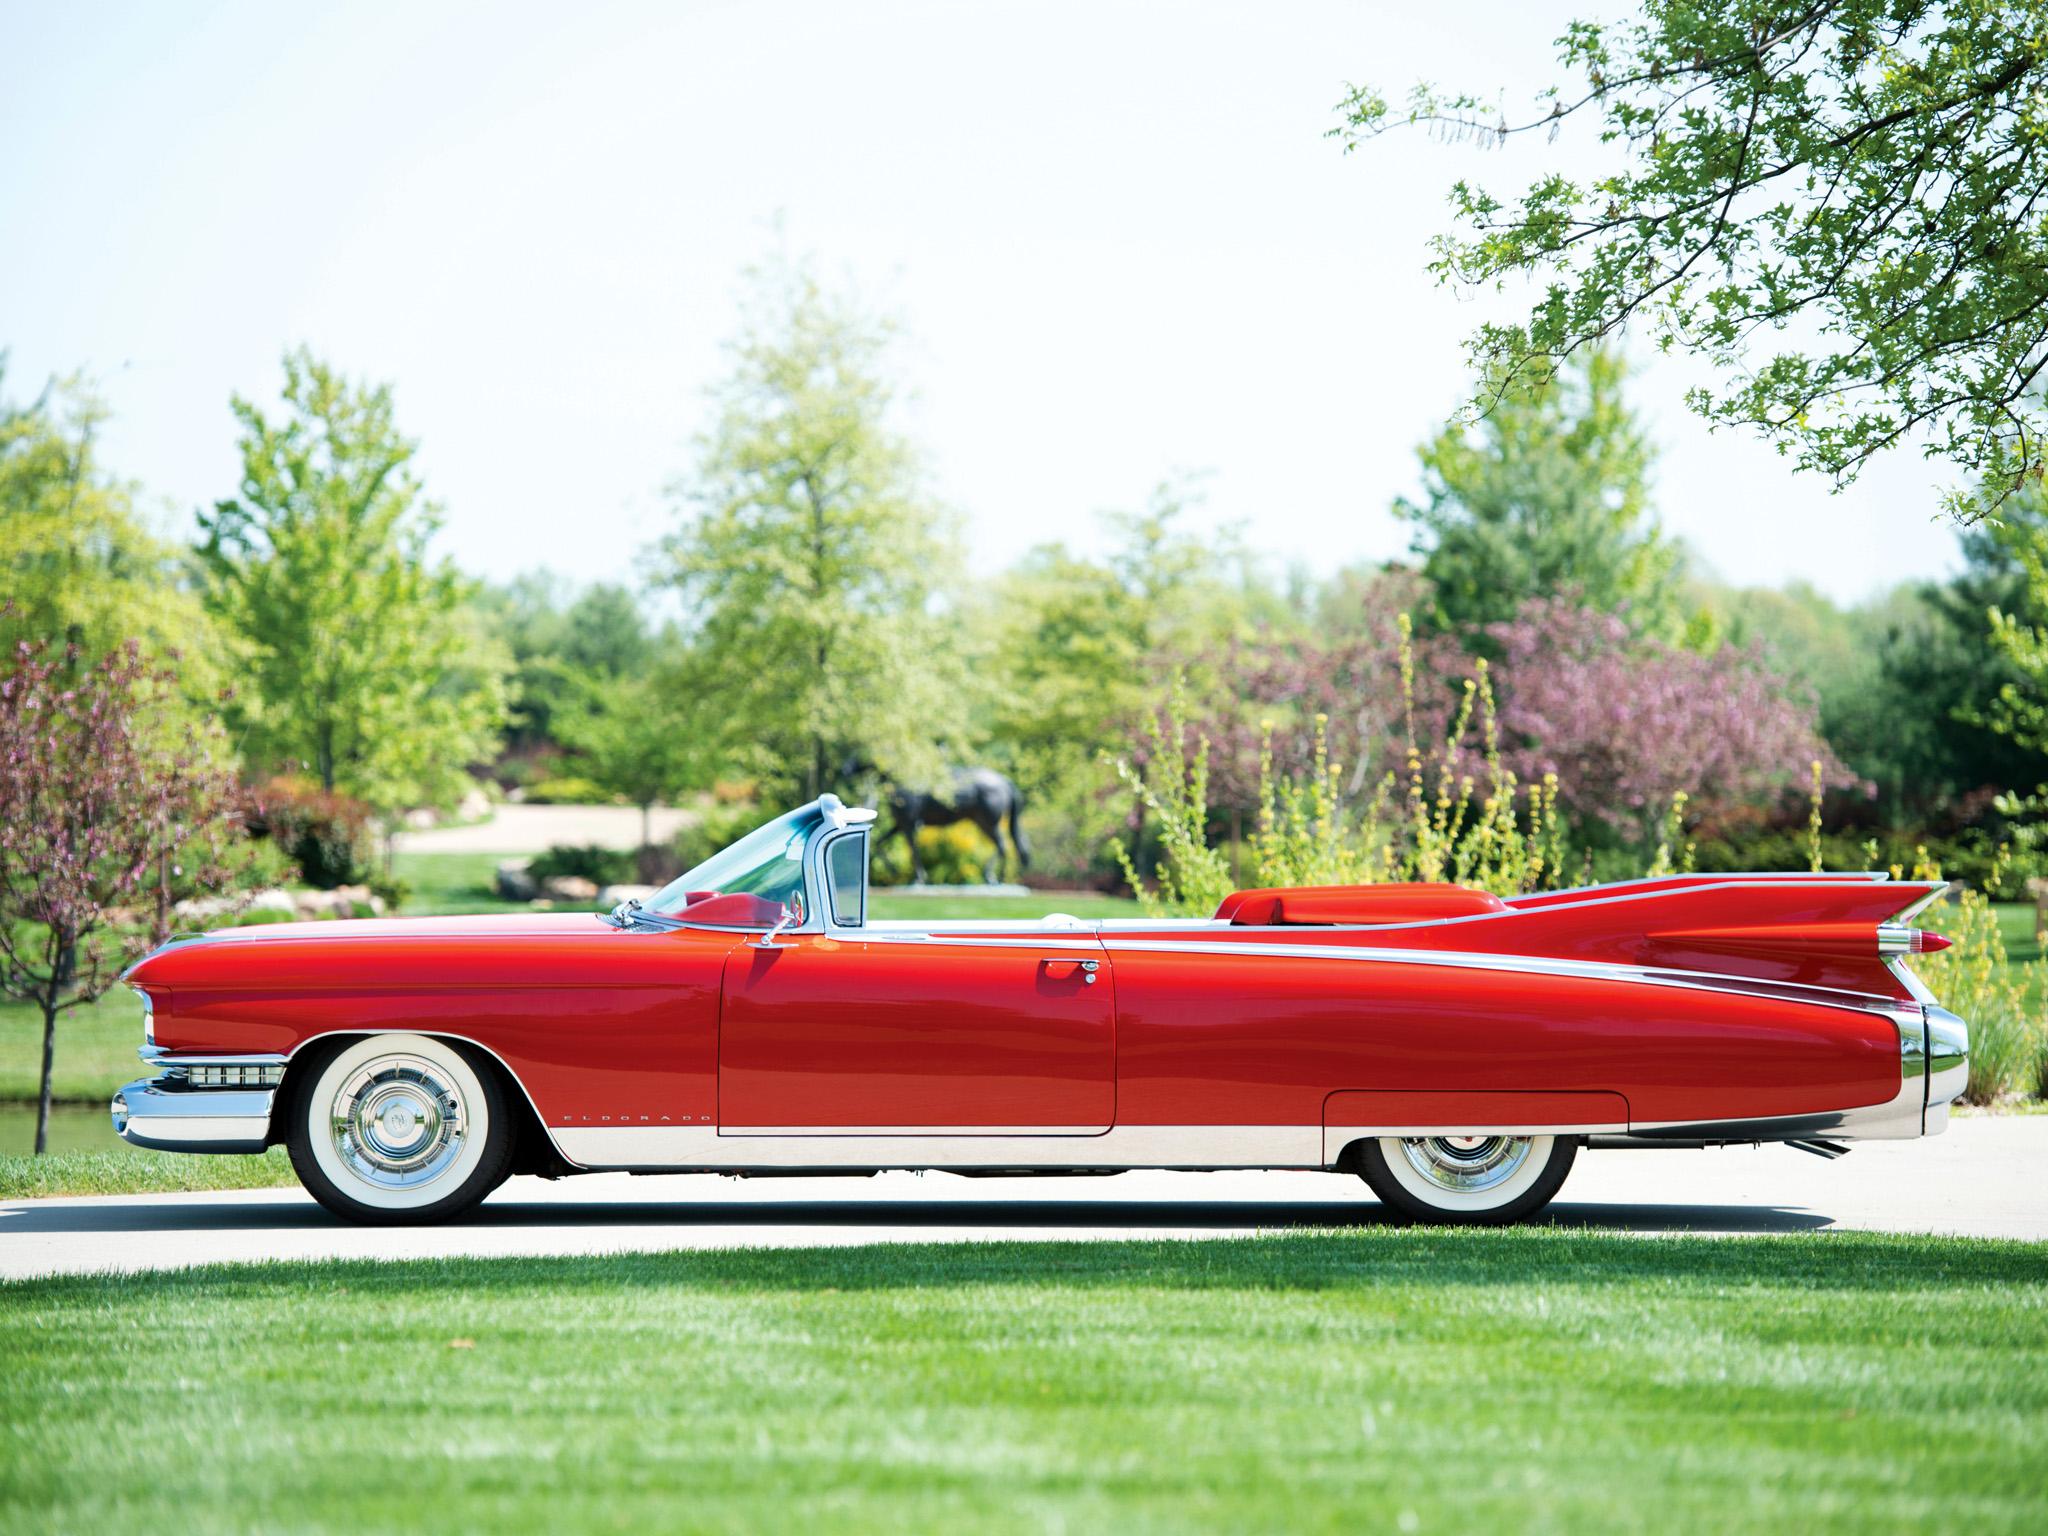 1959 Cadillac Eldorado Biarritz Luxury Classic Convertible